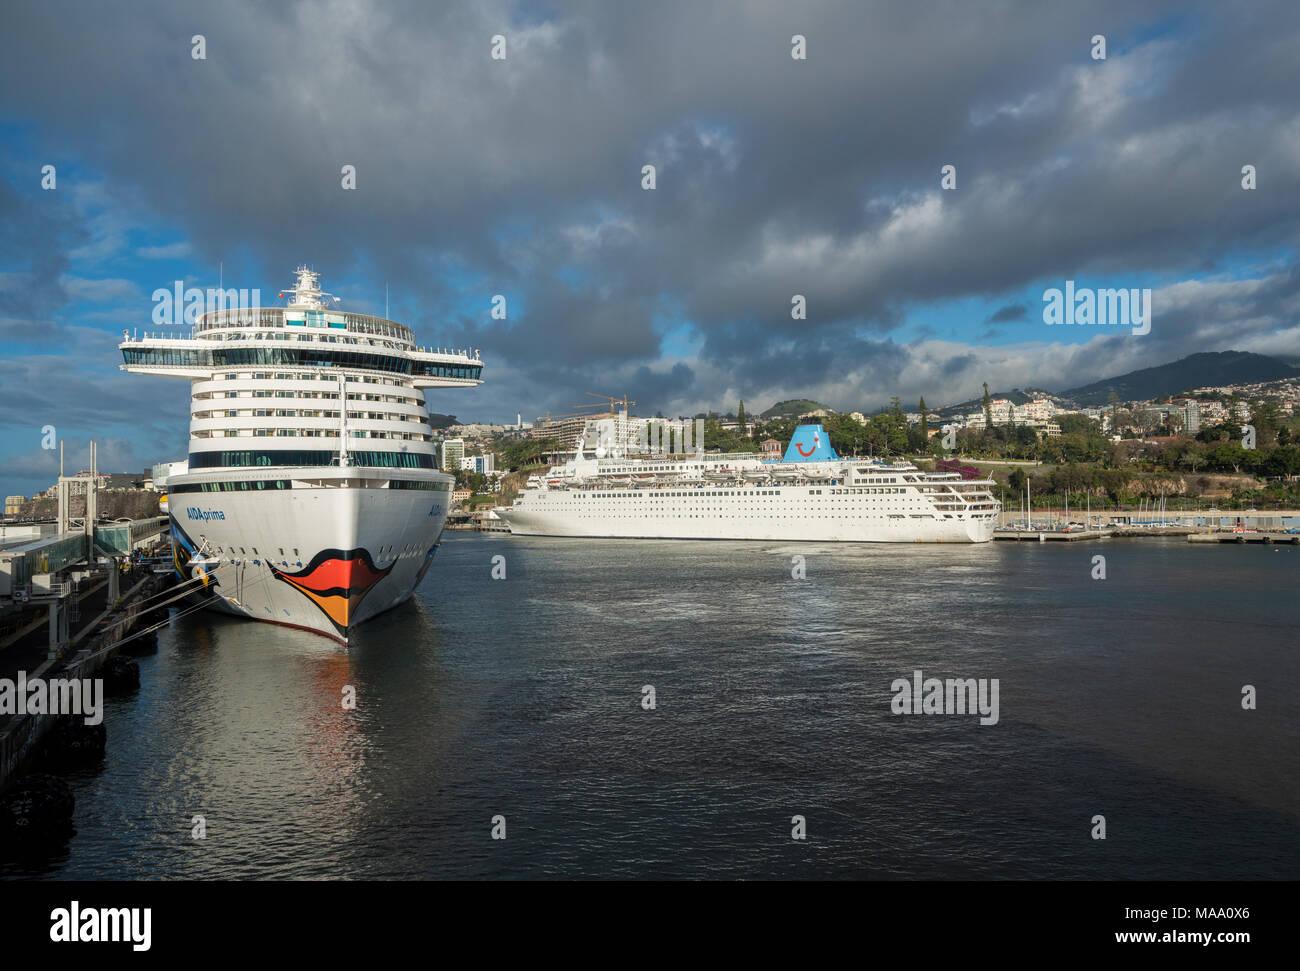 Aidaprima docked in harbor at Funchal Madiera - Stock Image